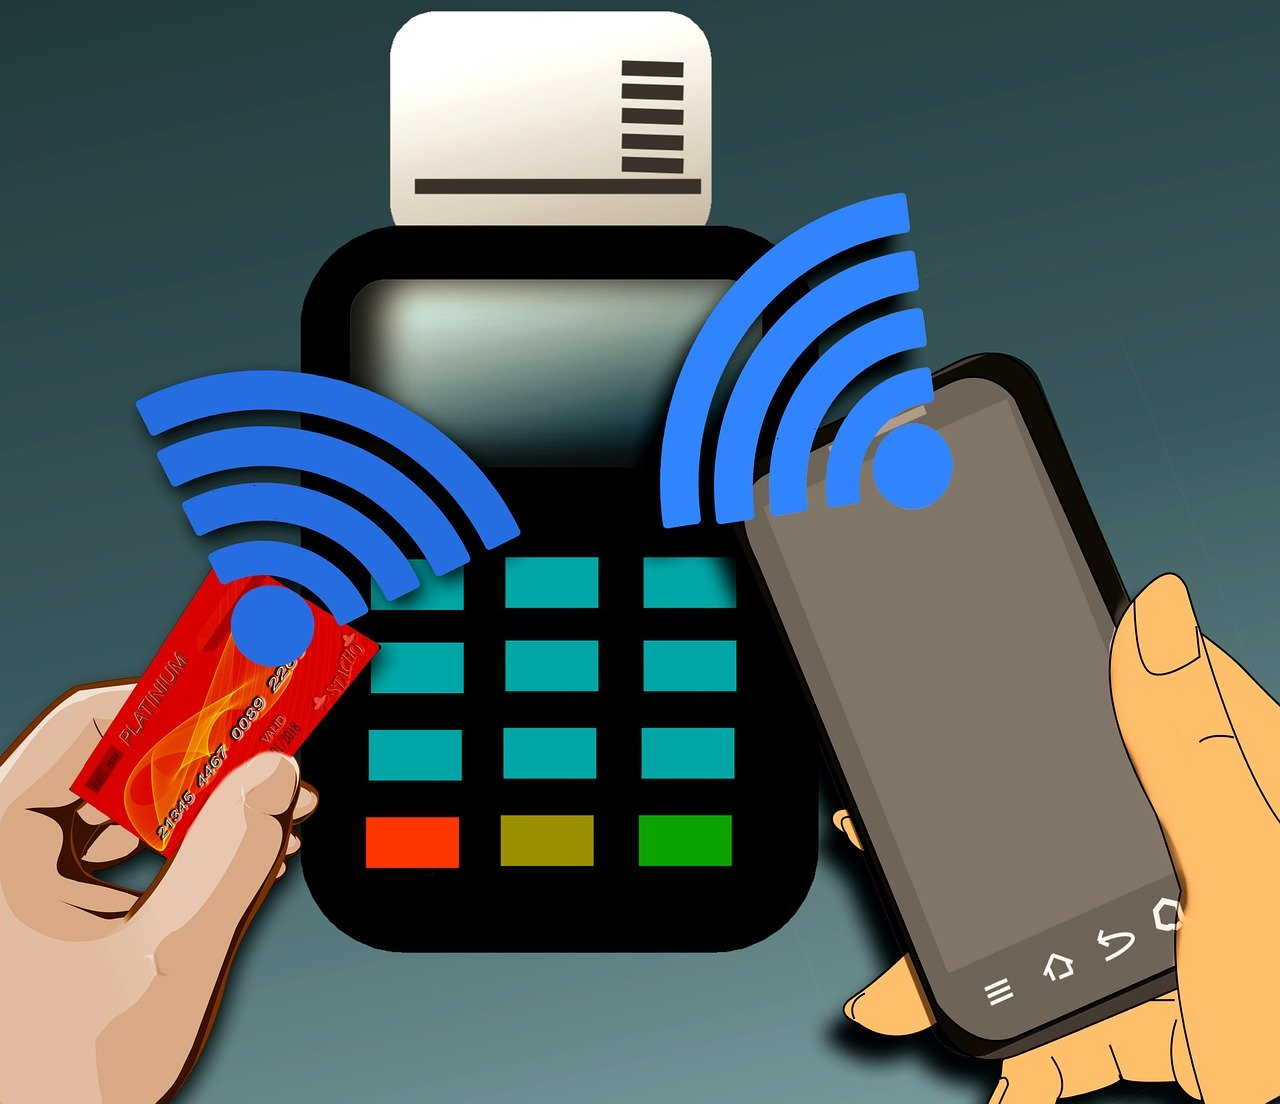 payment systems, nfc near field communication, wireless